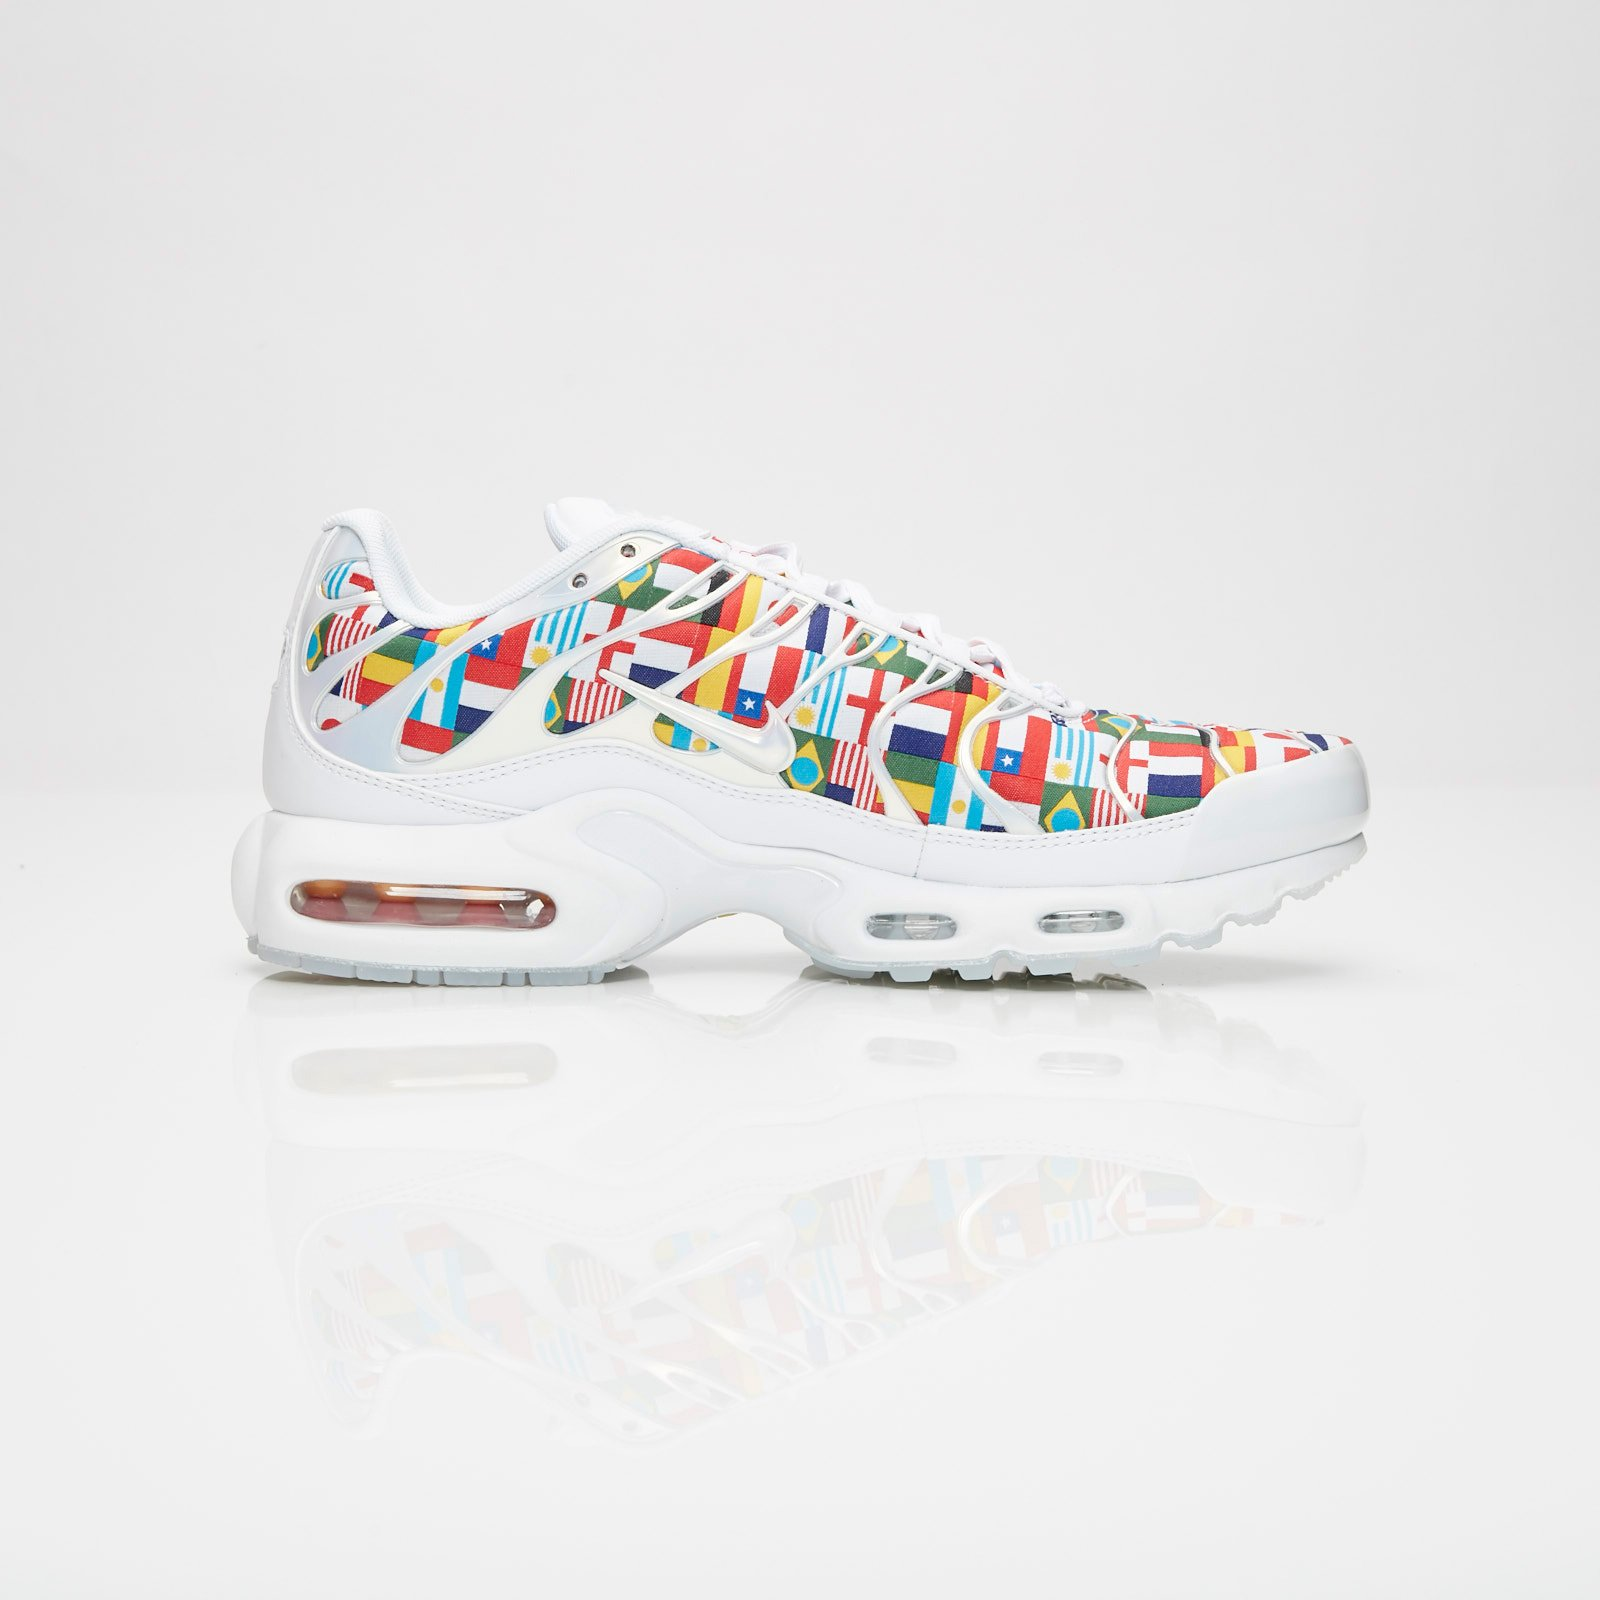 8d1c9f4842c Nike Air Max Plus NIC QS - Ao5117-100 - Sneakersnstuff